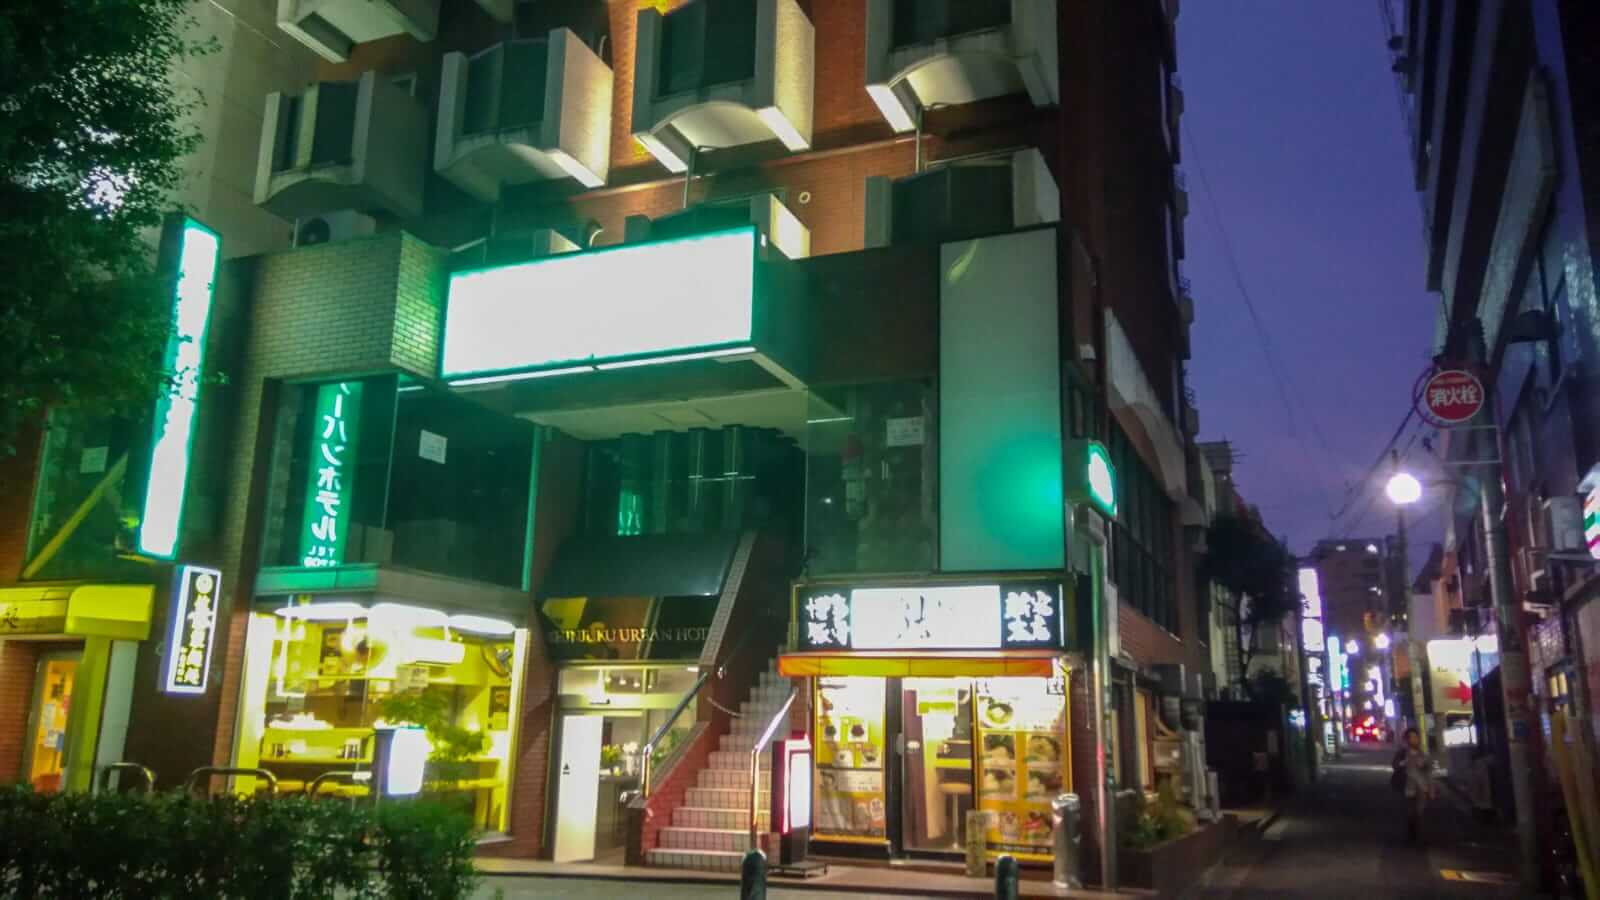 Shinjuku Urban Hotel and a great ramen place next door.